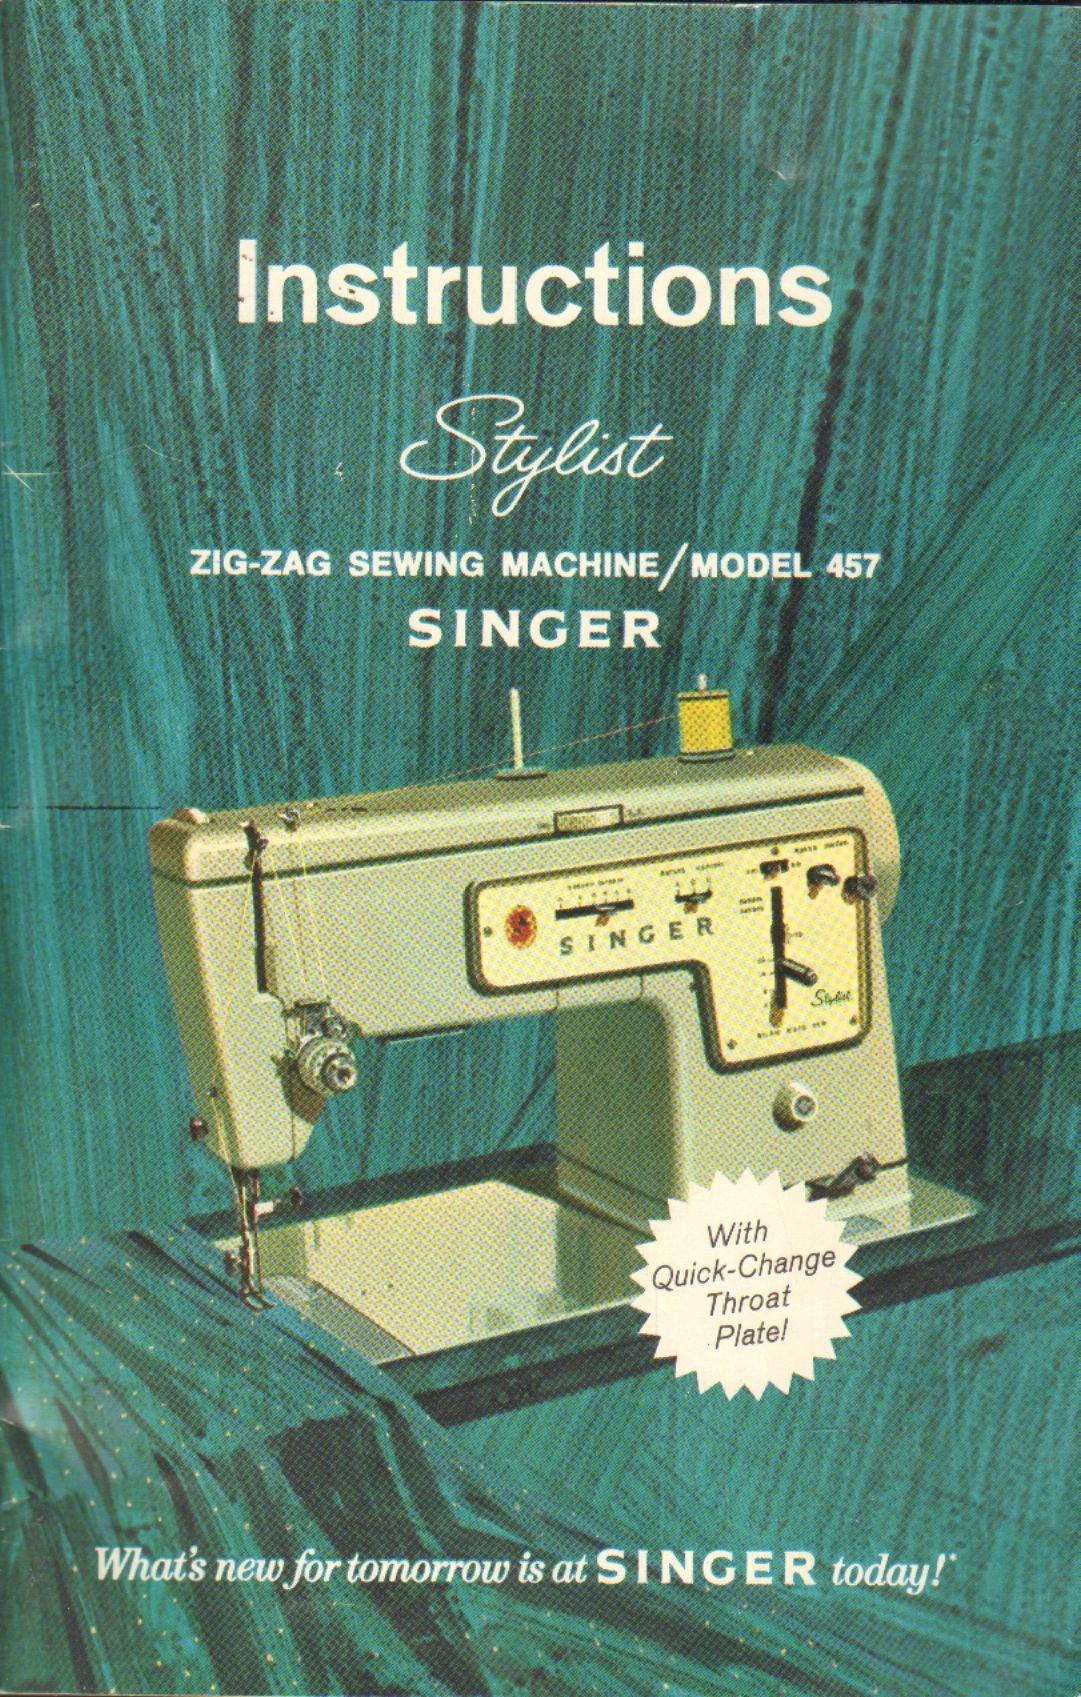 Singer stylist zig-zag sewing machine model 457 manual | ebay.